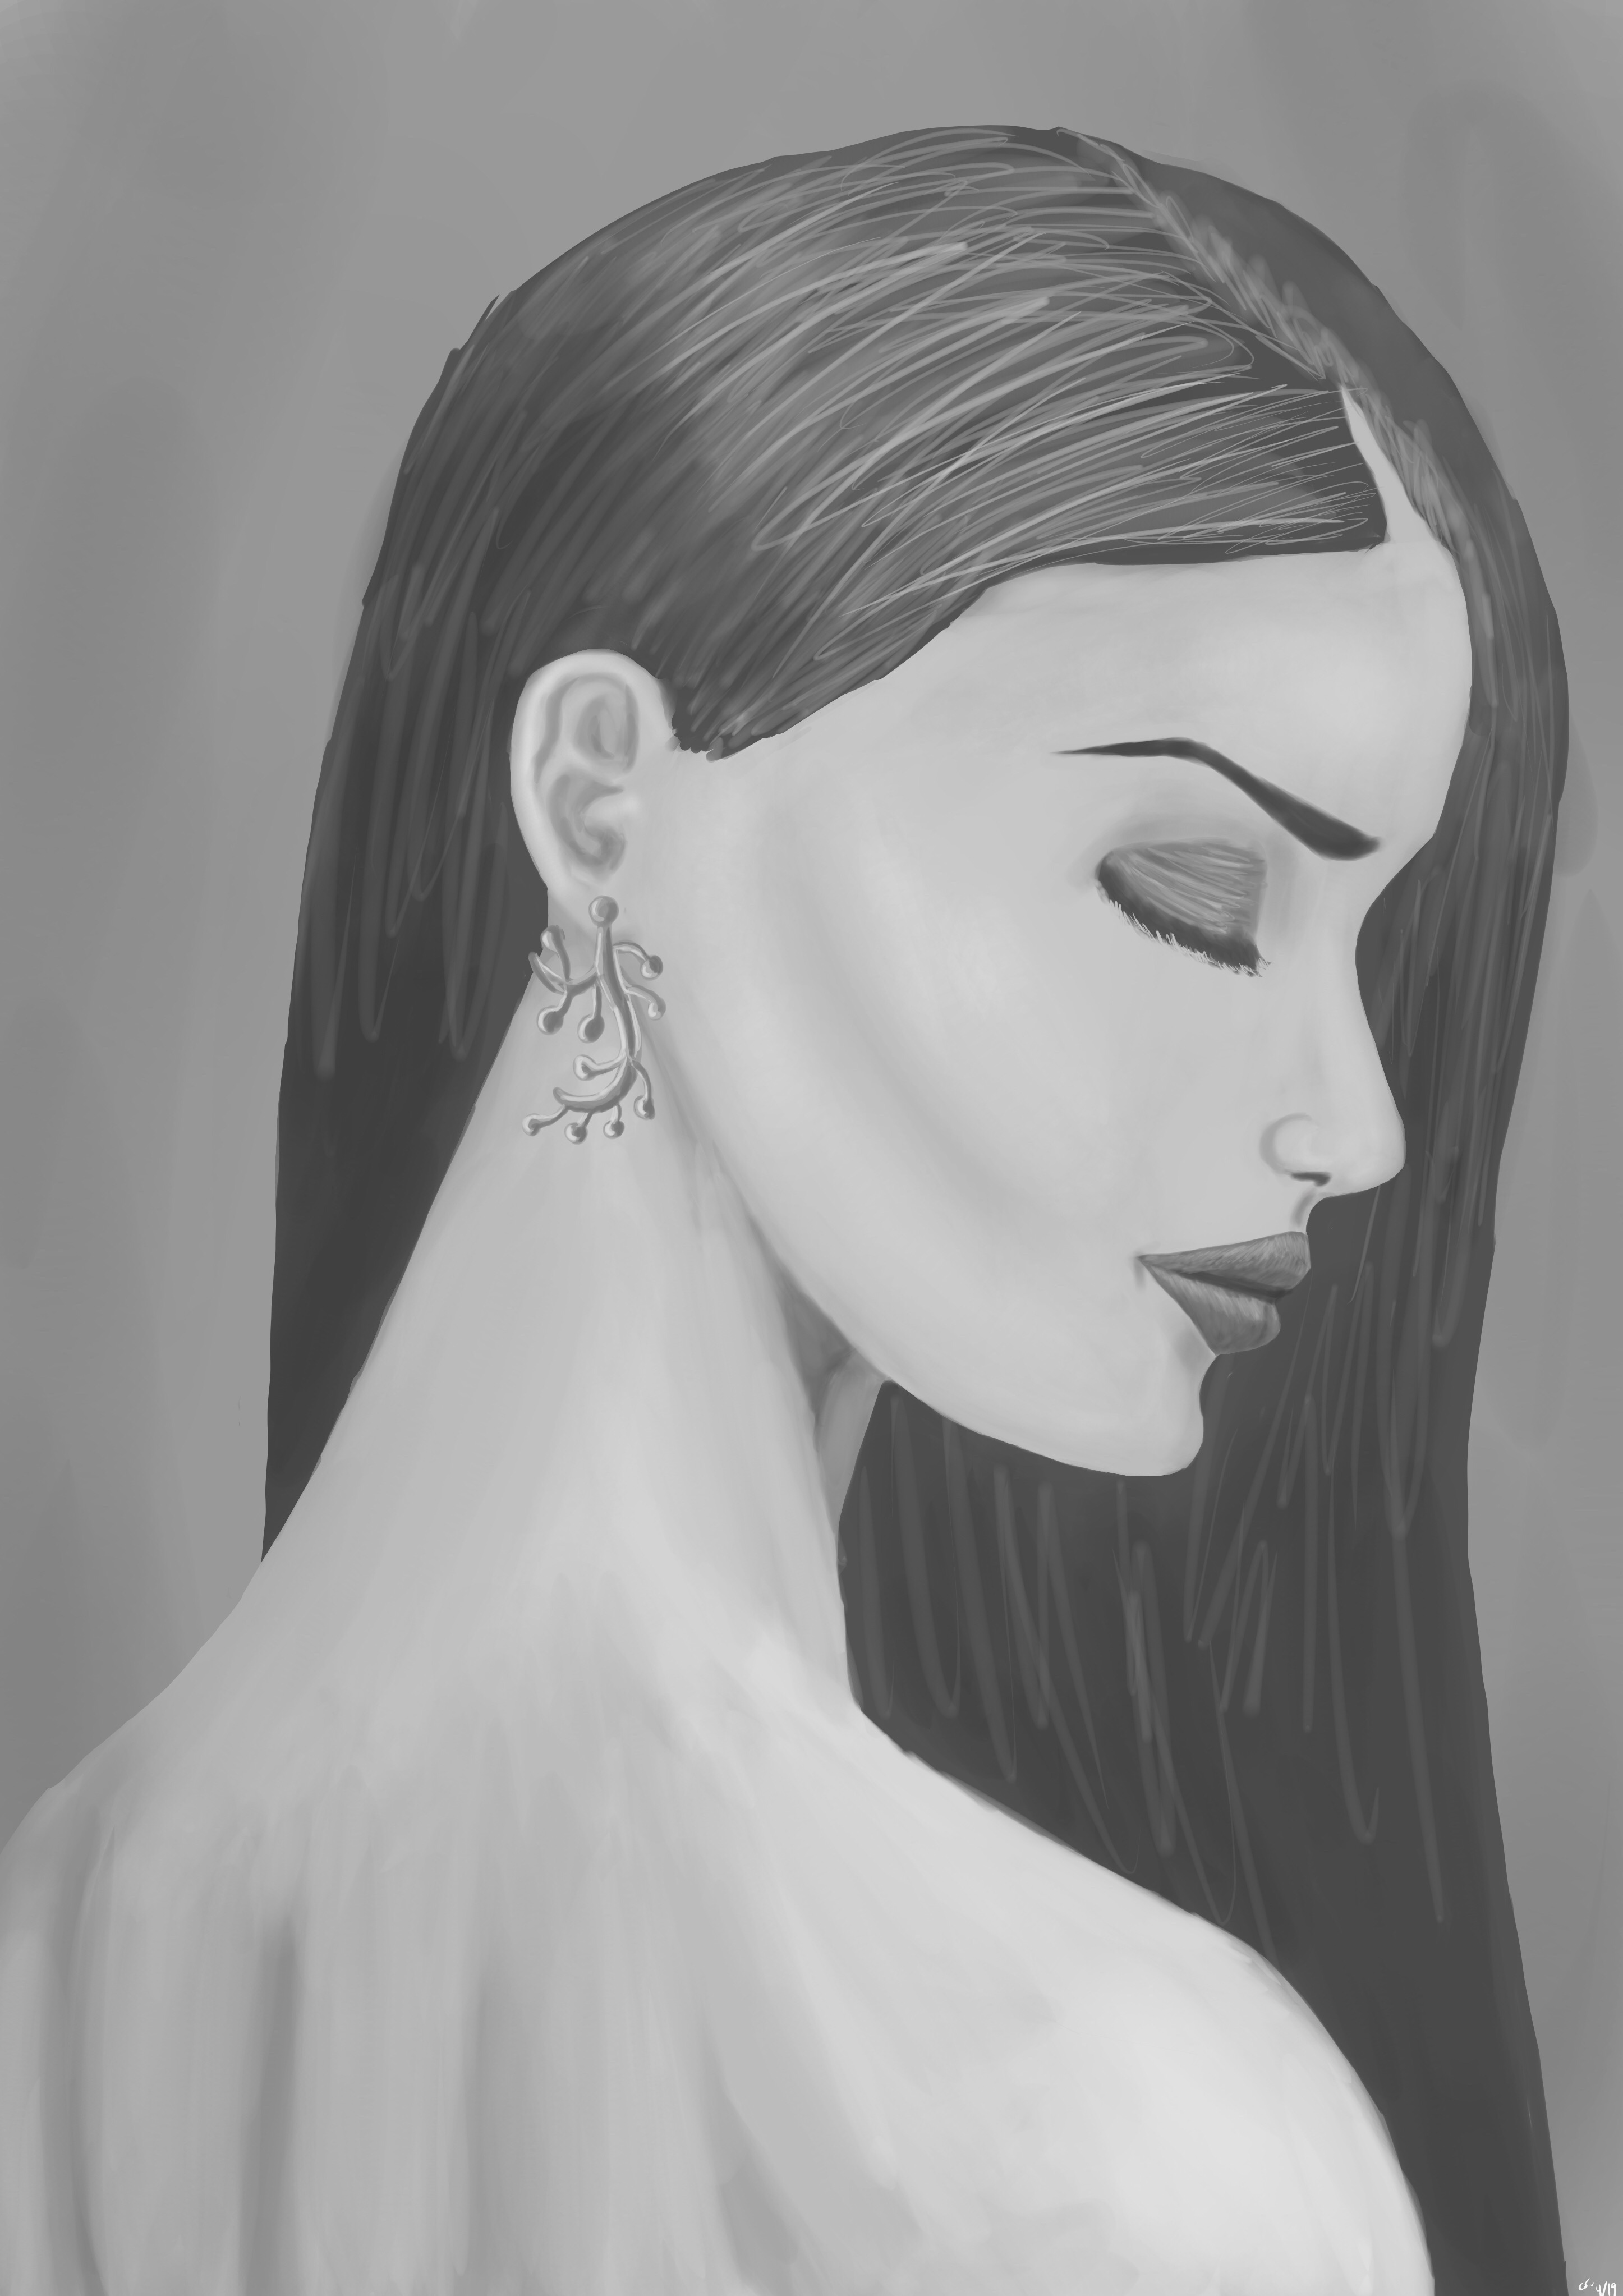 Woman: Greyscale